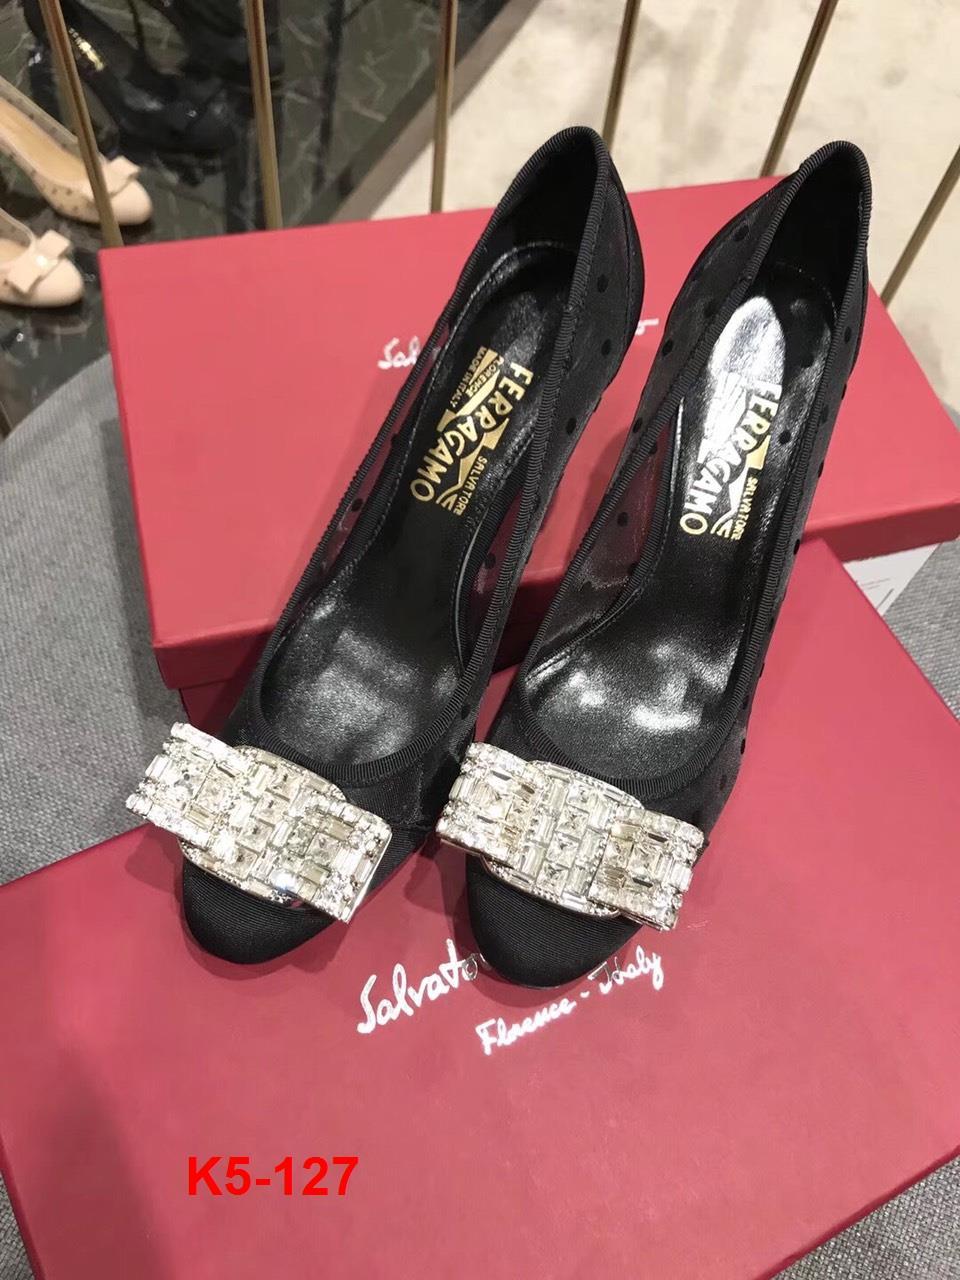 K5-127 Salvatore Ferragamo giày cao 7cm siêu cấp